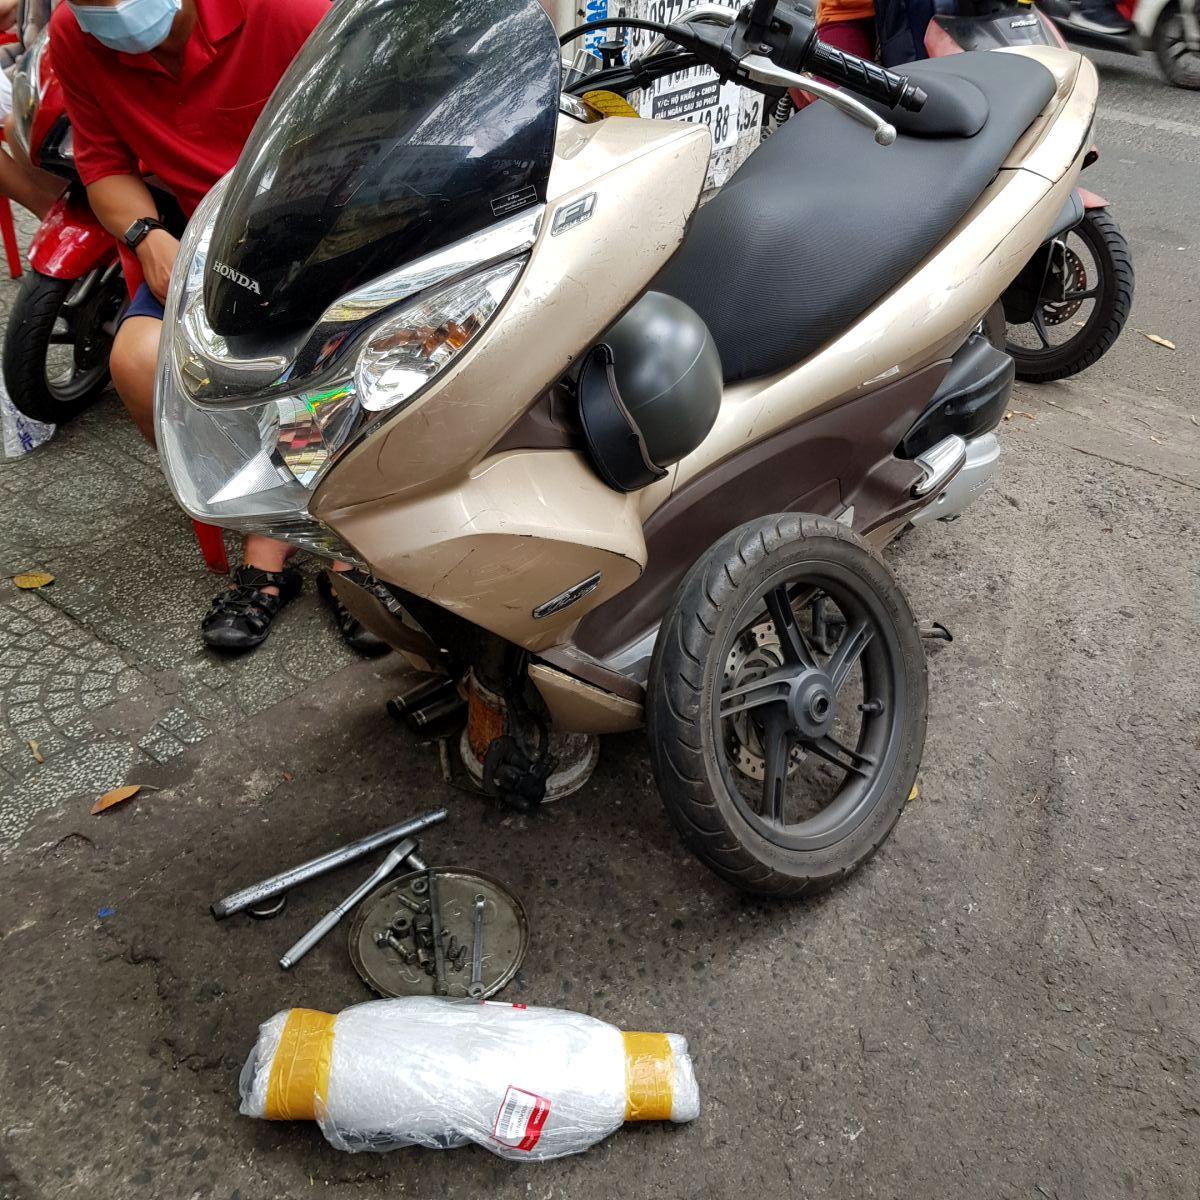 Phuoc-nhun-giam-xoc-truoc-PCX-Thai-Lan-chinh-hang-Honda-7